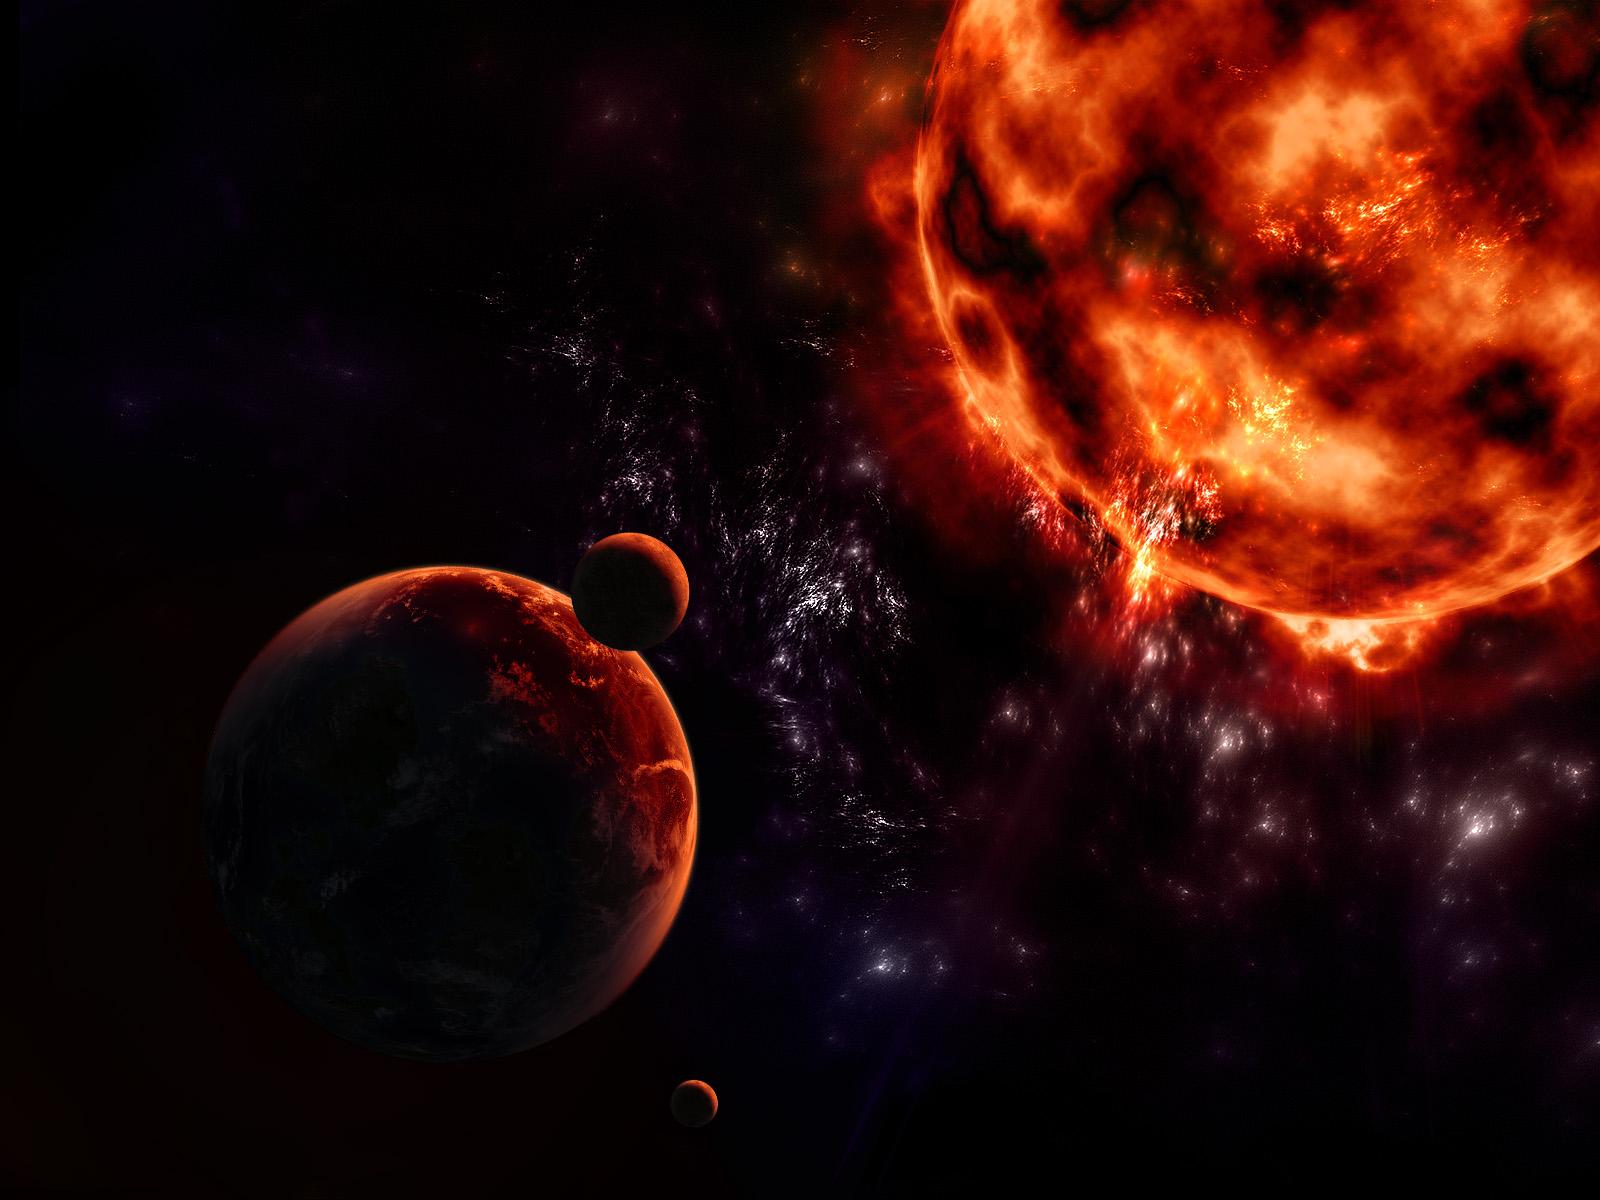 The dark sun by Anikoo